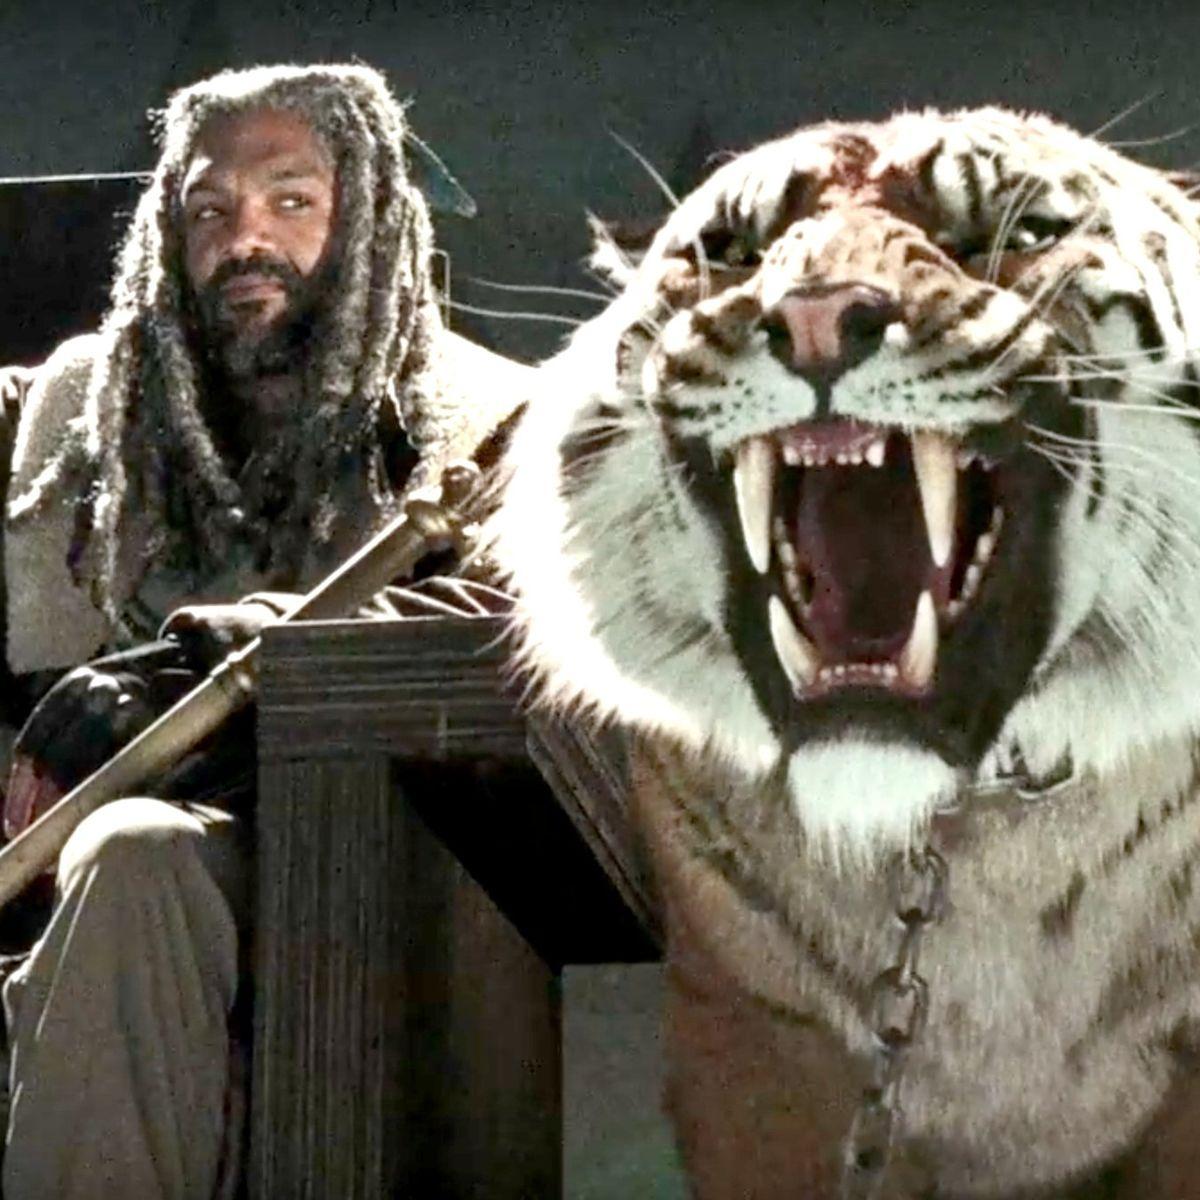 The Walking Dead - King Ezekiel and Shiva